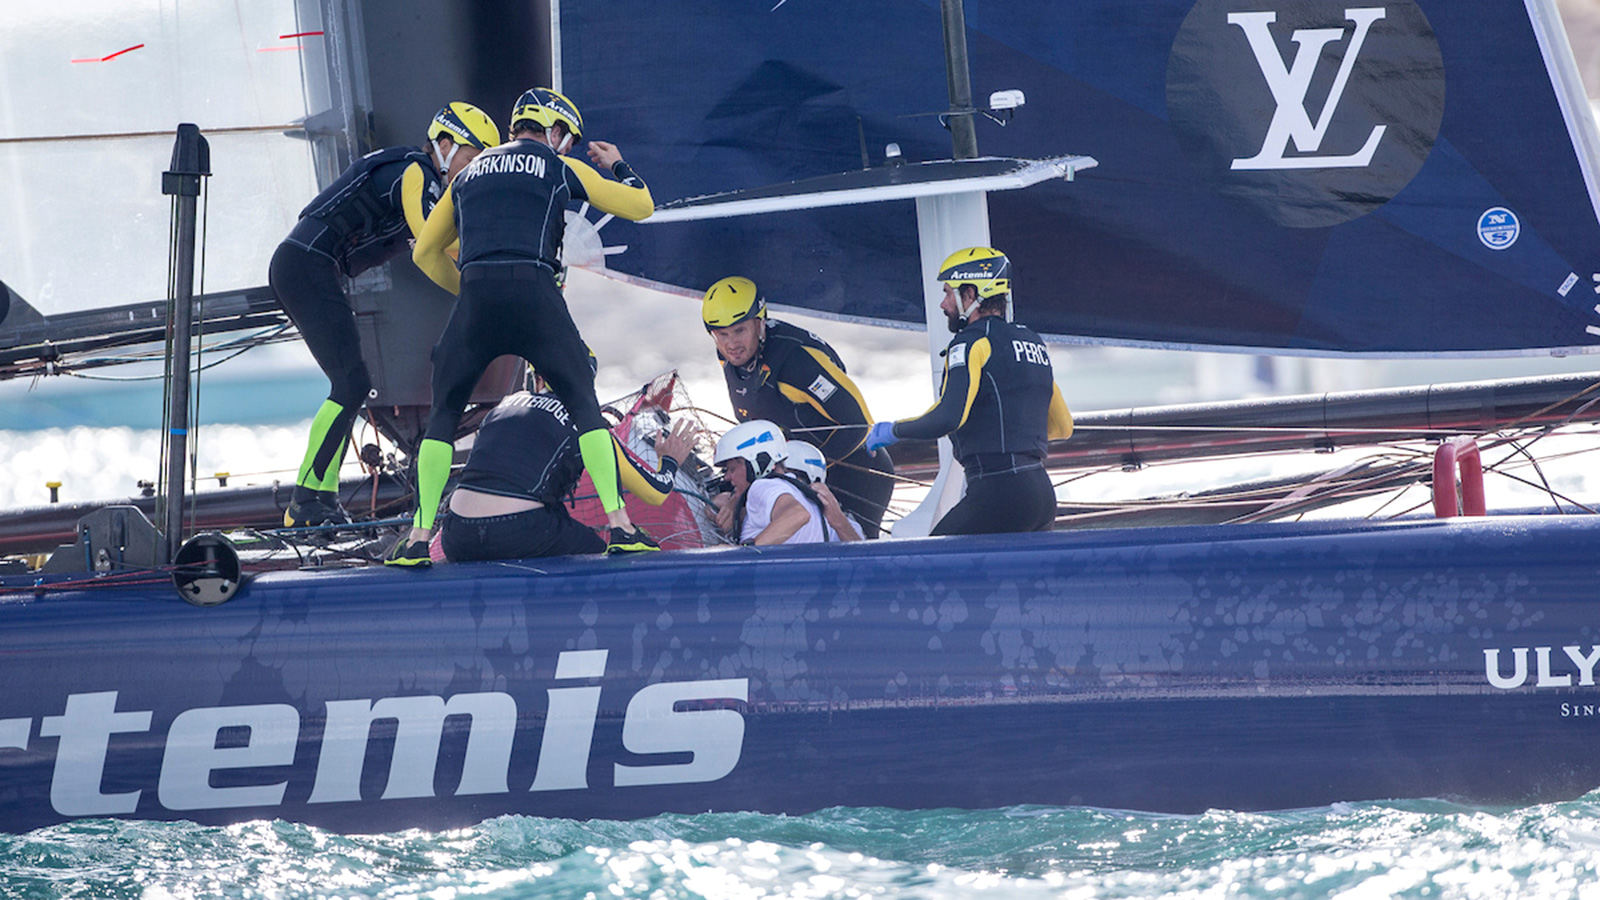 Americas Cup World Series Bermuda Crash